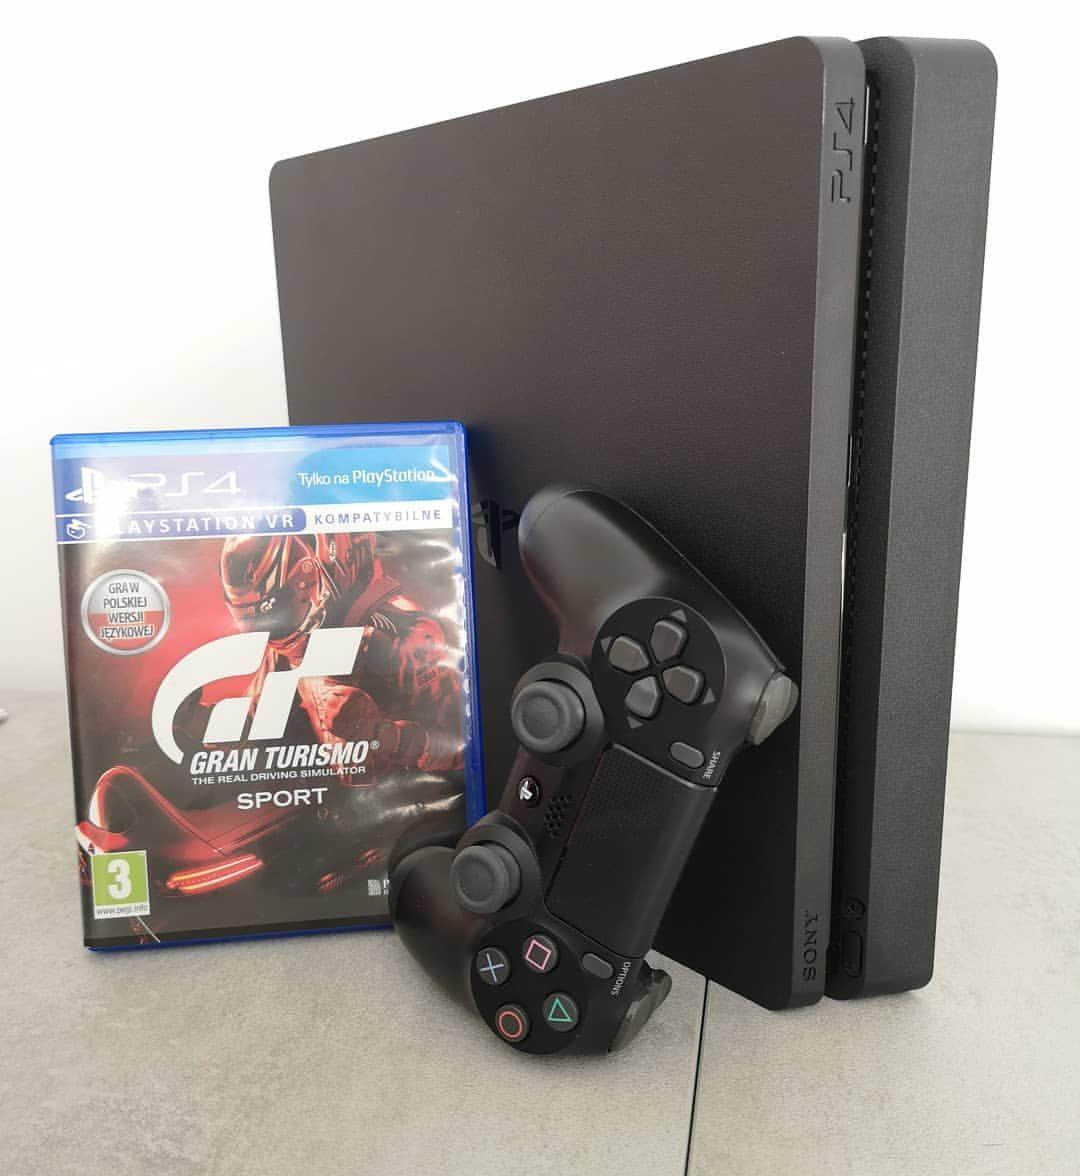 Ps4 Slim 500 Gb Z Gra Gran Turismo Sport Pl 749 Zl Sony